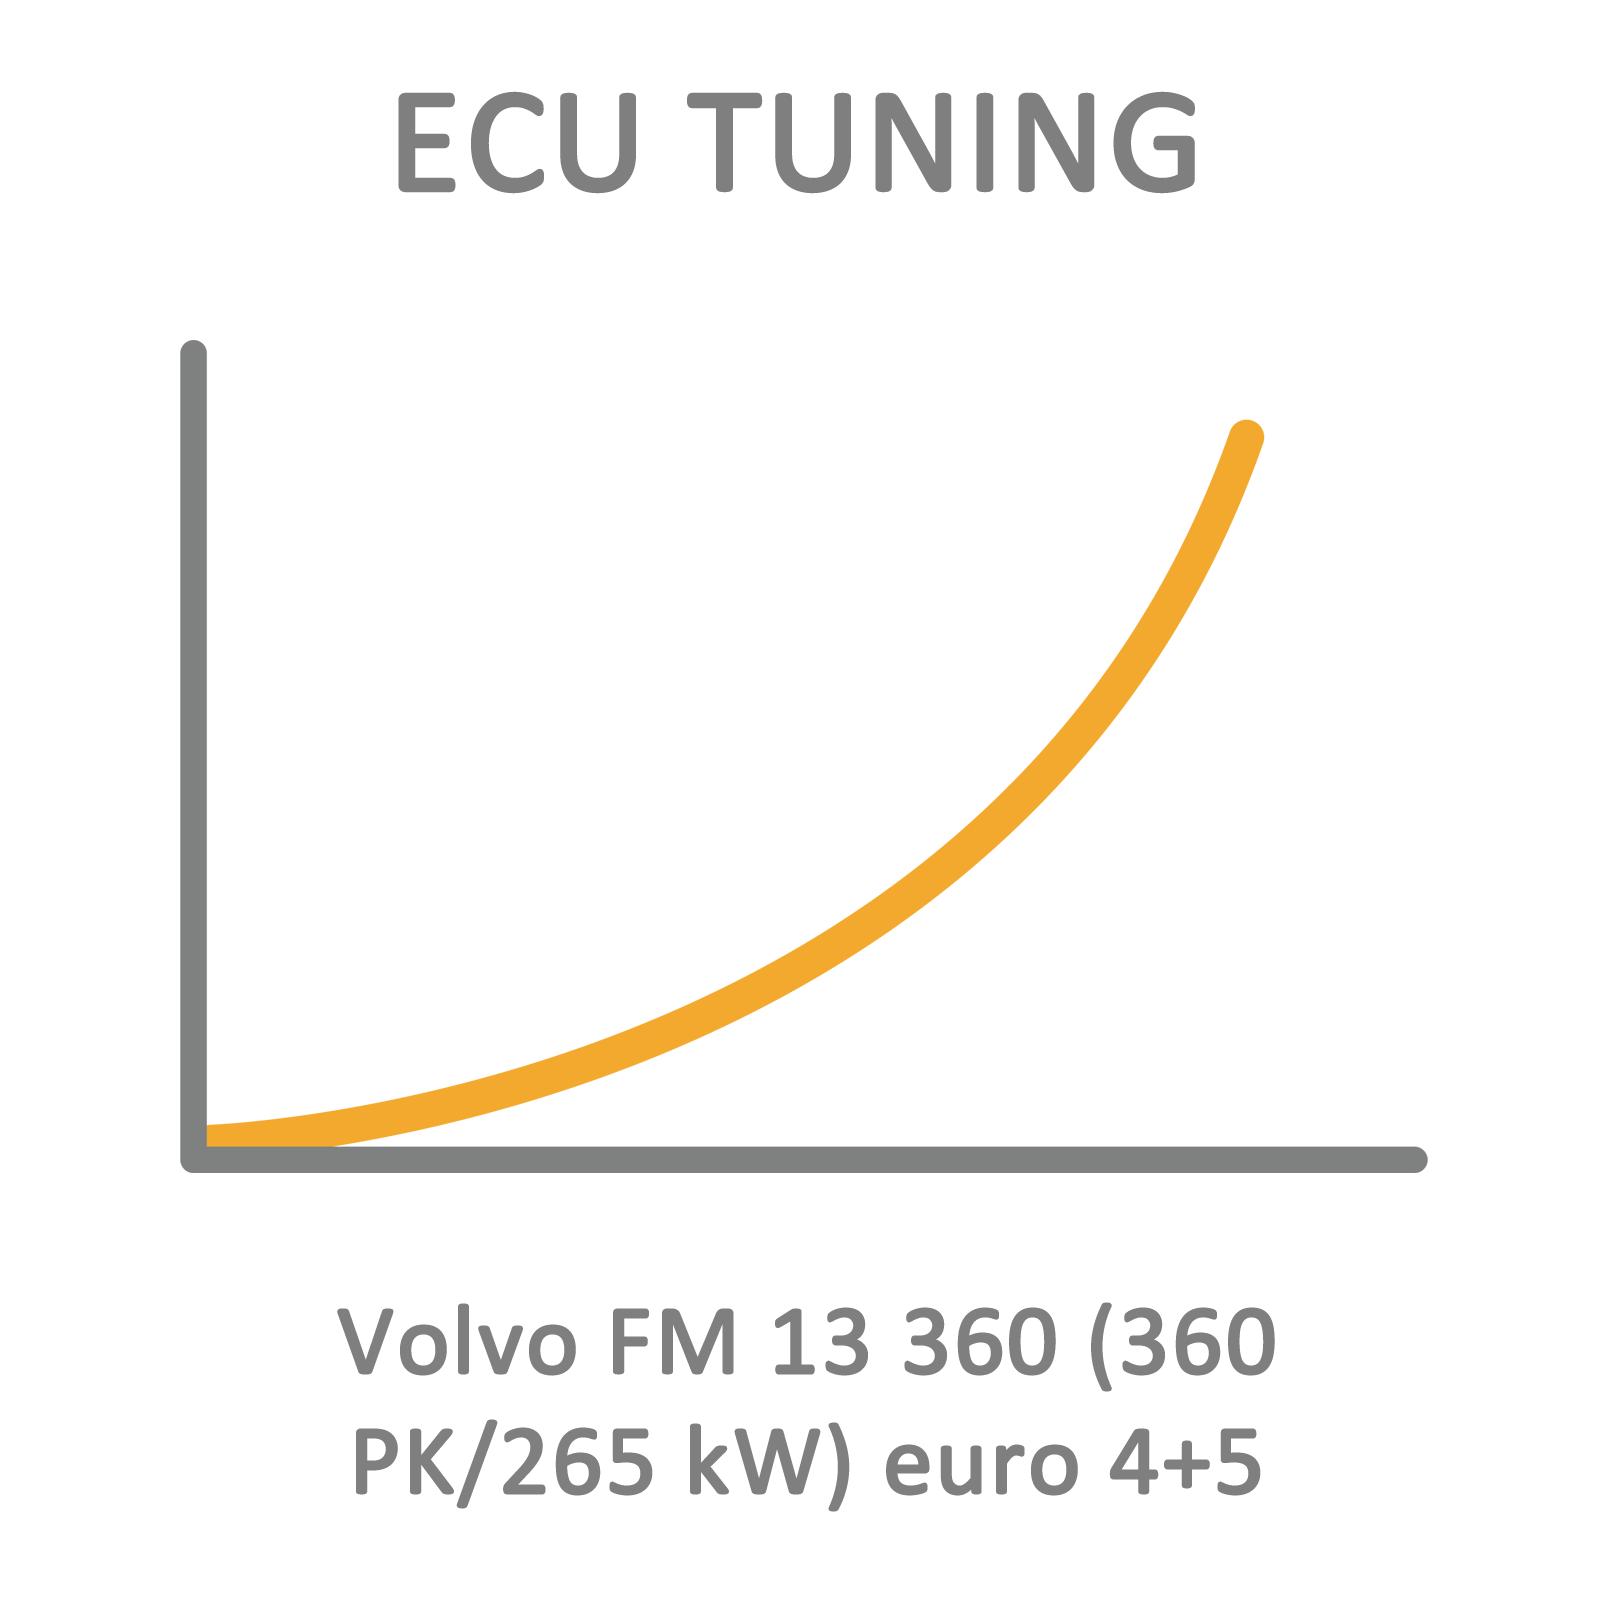 Volvo Fm 13 360 360 Pk 265 Kw Euro 4 5 Ecu Tuning